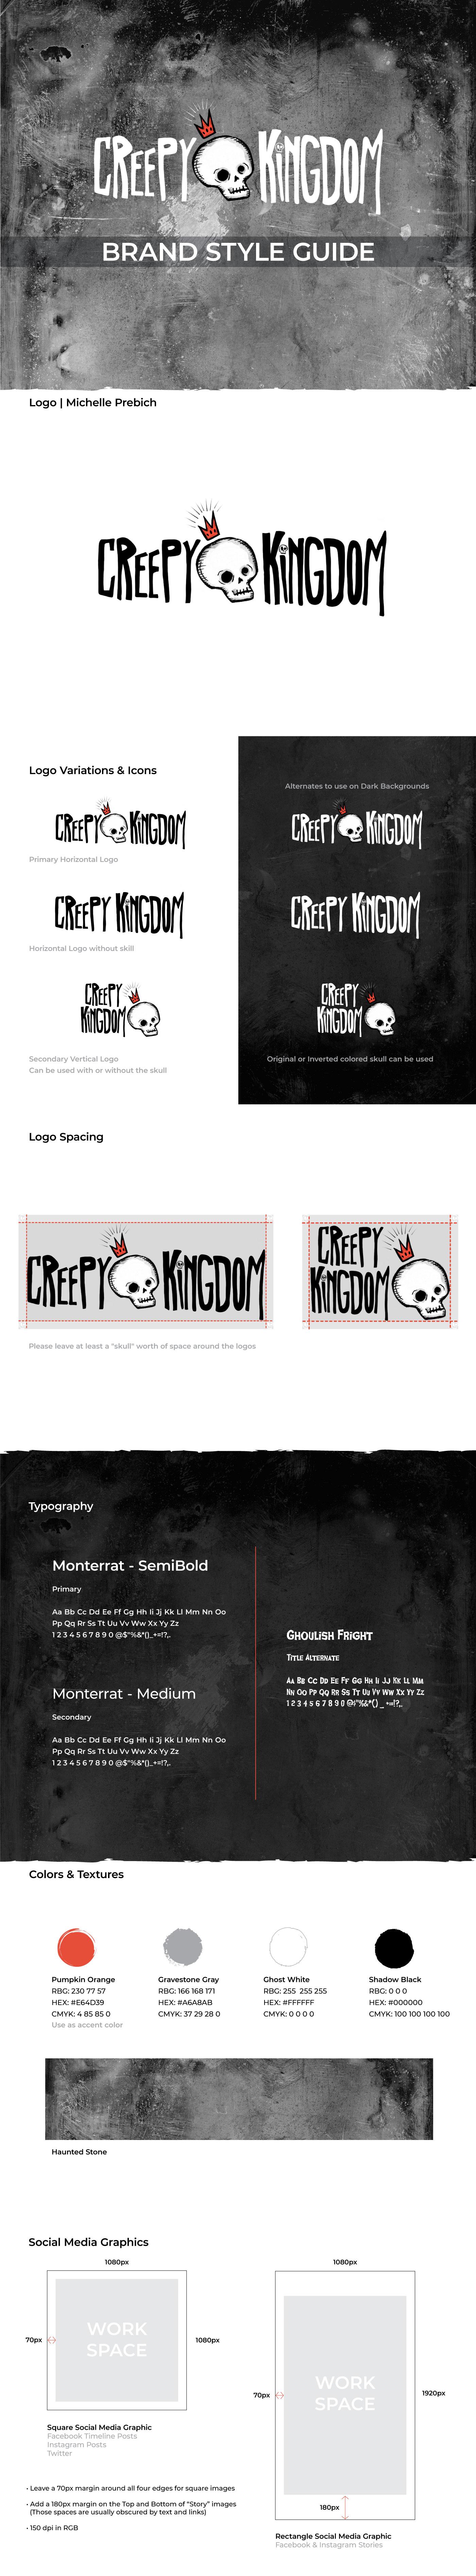 Creepy_Kingdom-STYLEGUIDE.jpg